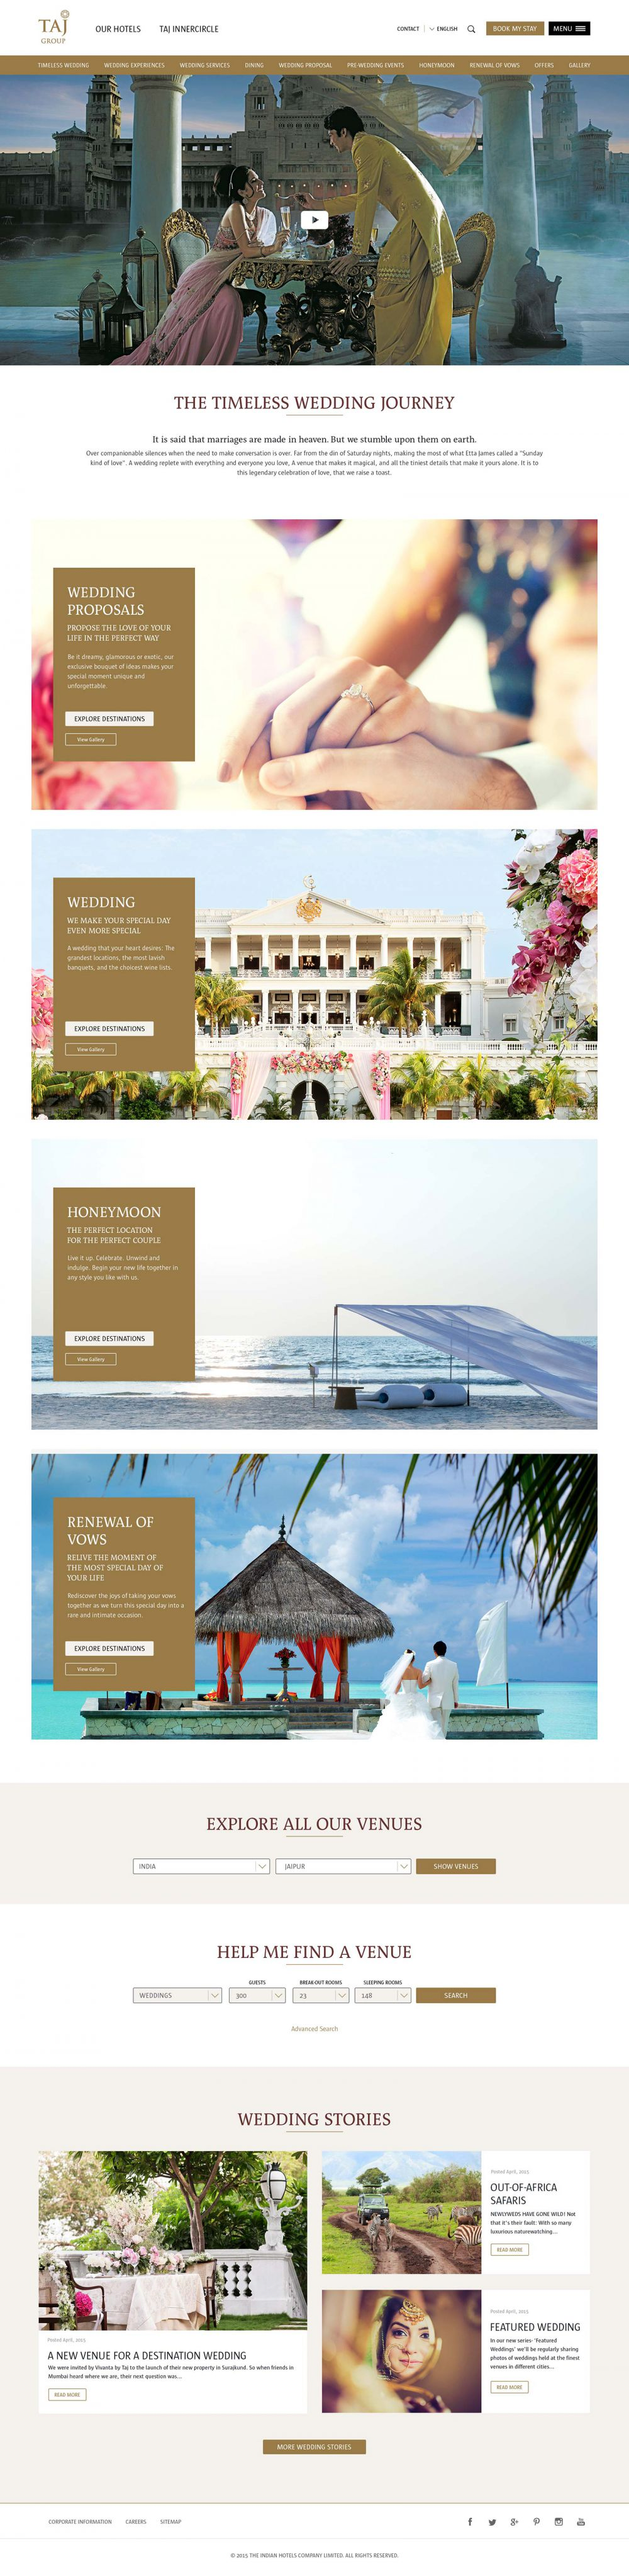 Weddings at Taj web page